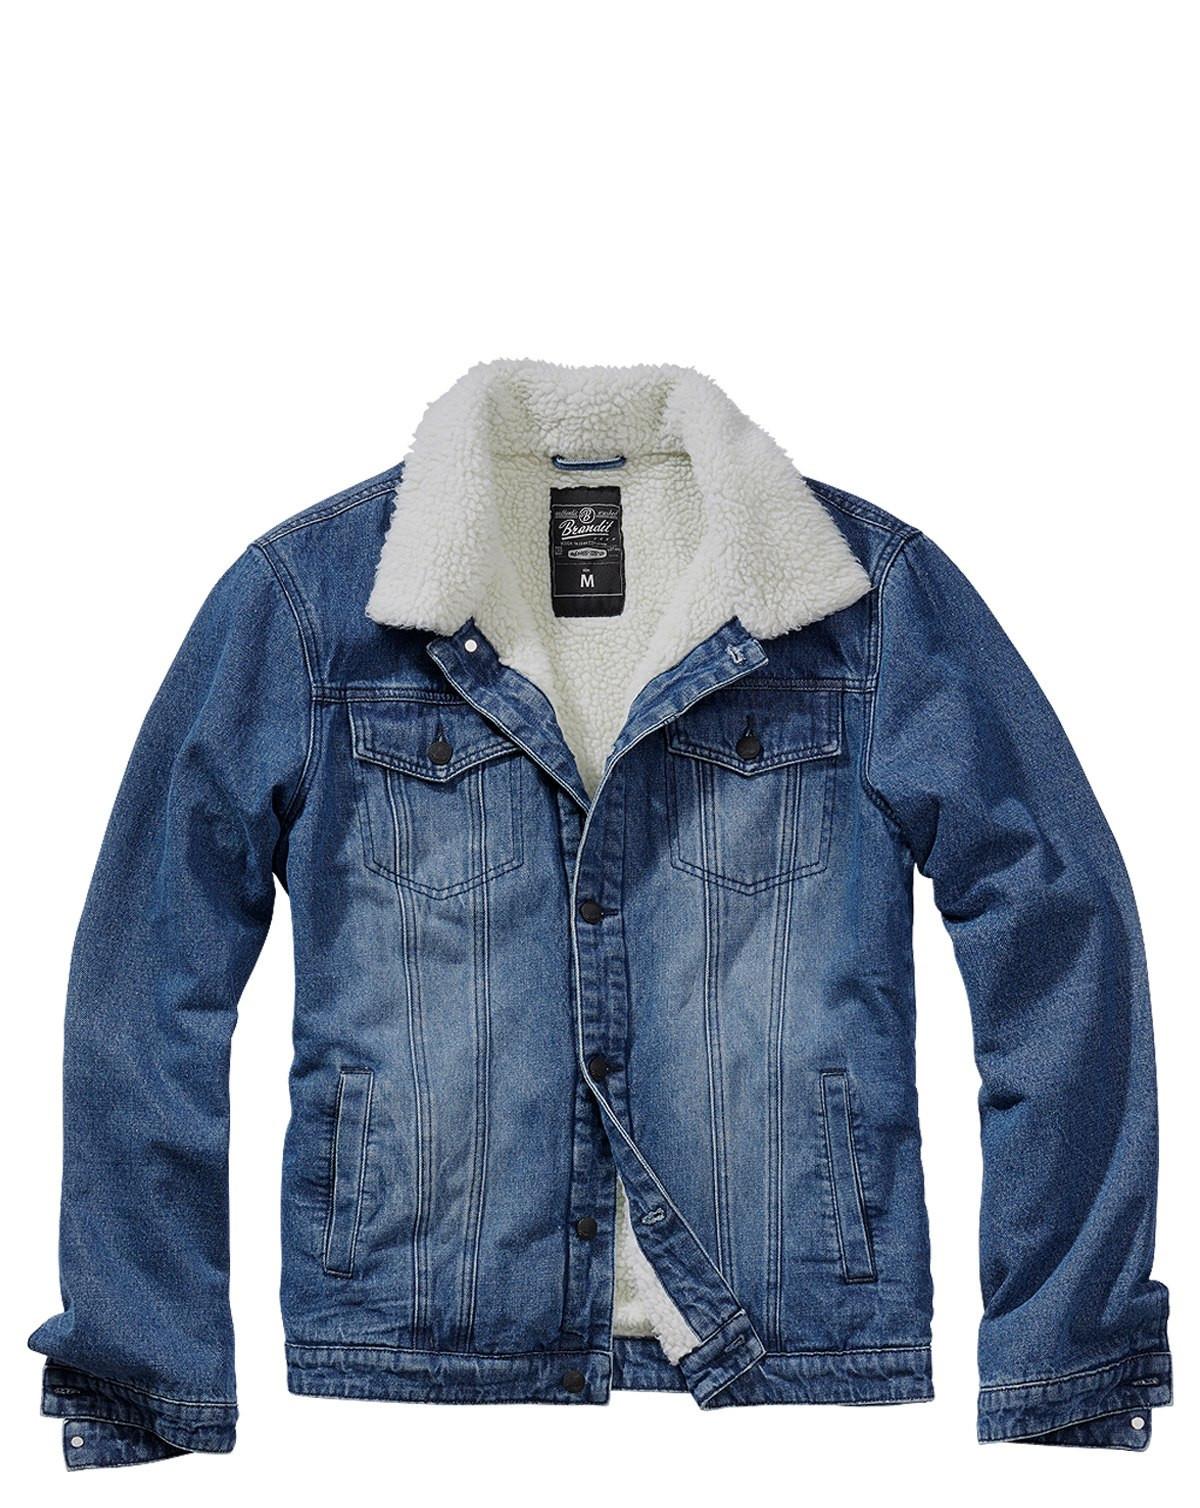 Brandit Sherpa Jeansjacka (Denim Blue / Off White, XL)